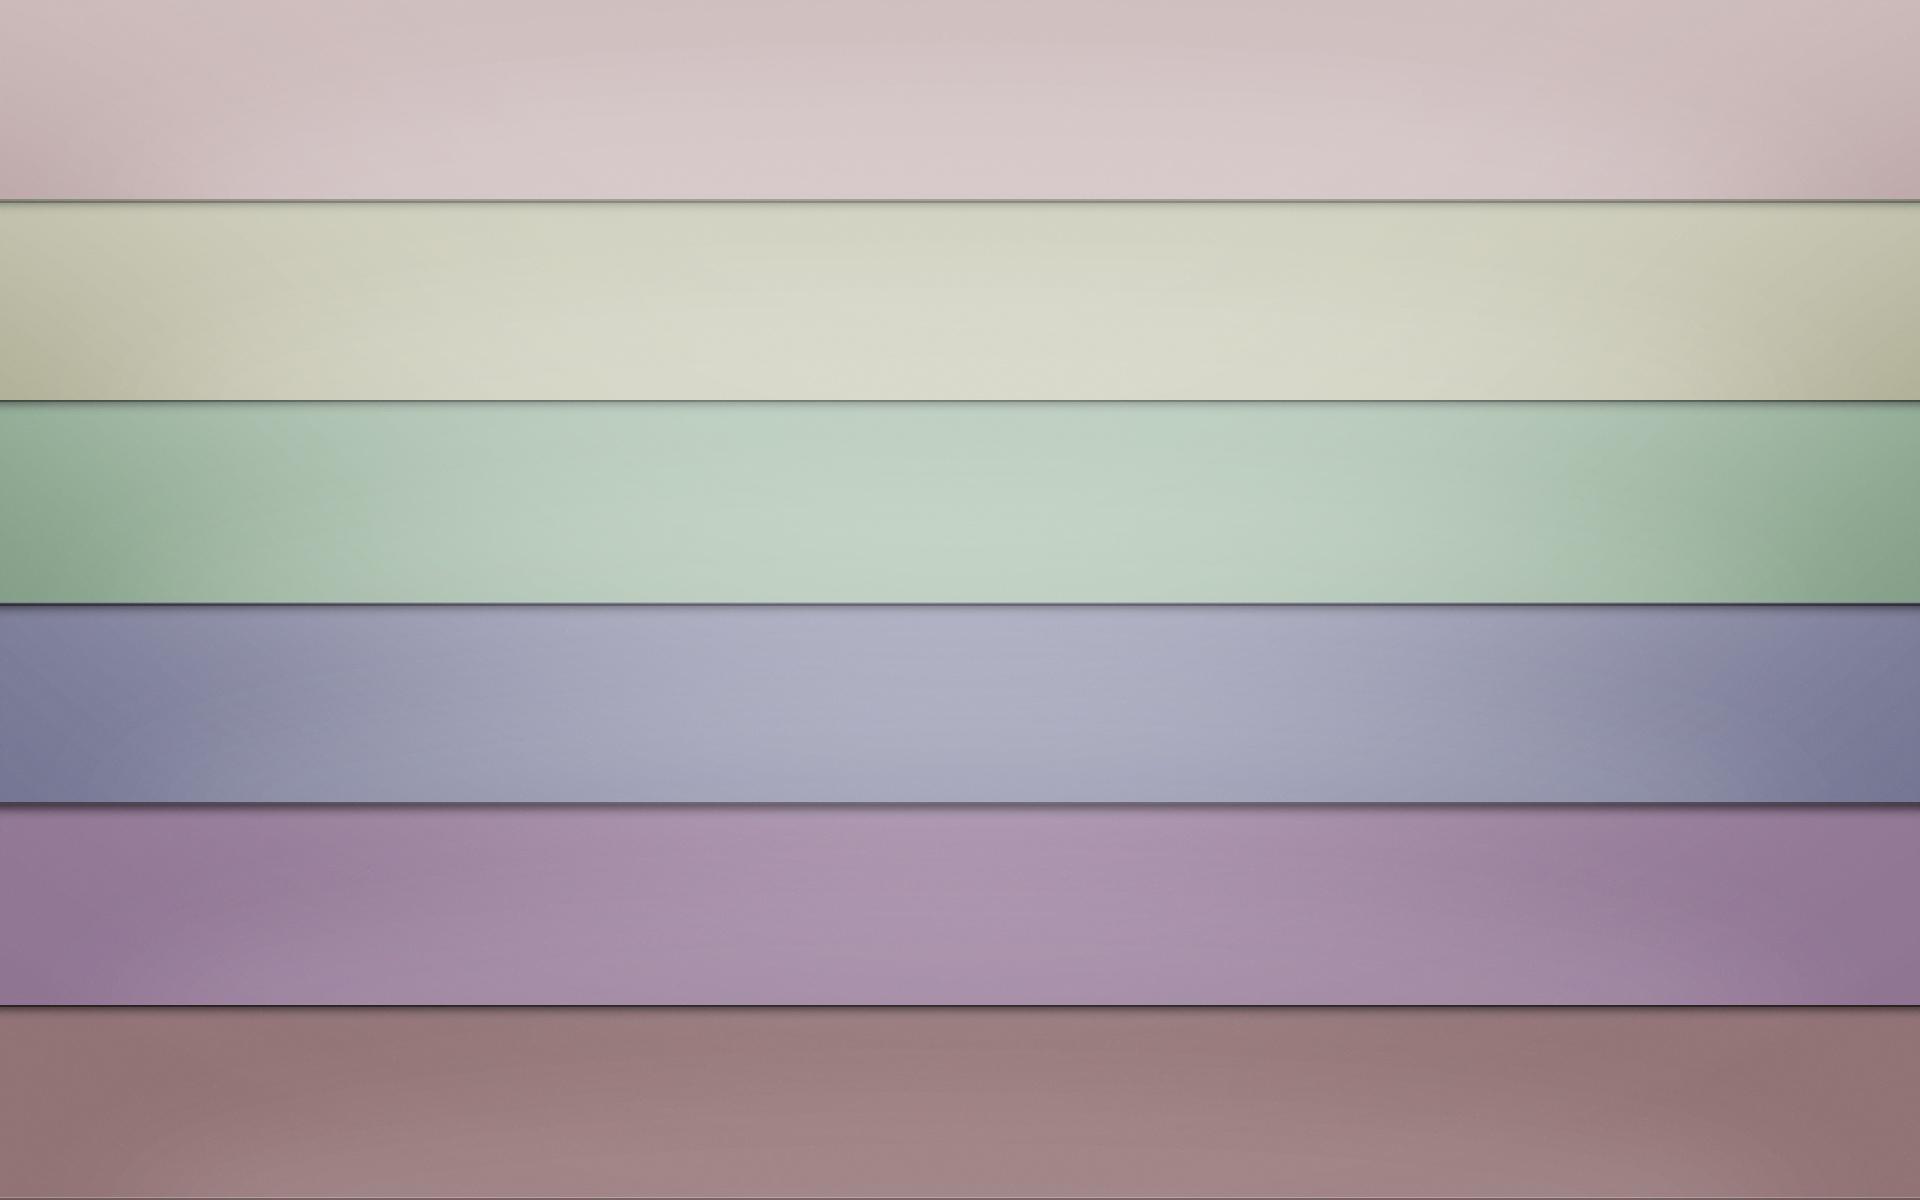 wallpaper colores pastel retro minimalista pastel2 imagen 1920x1200